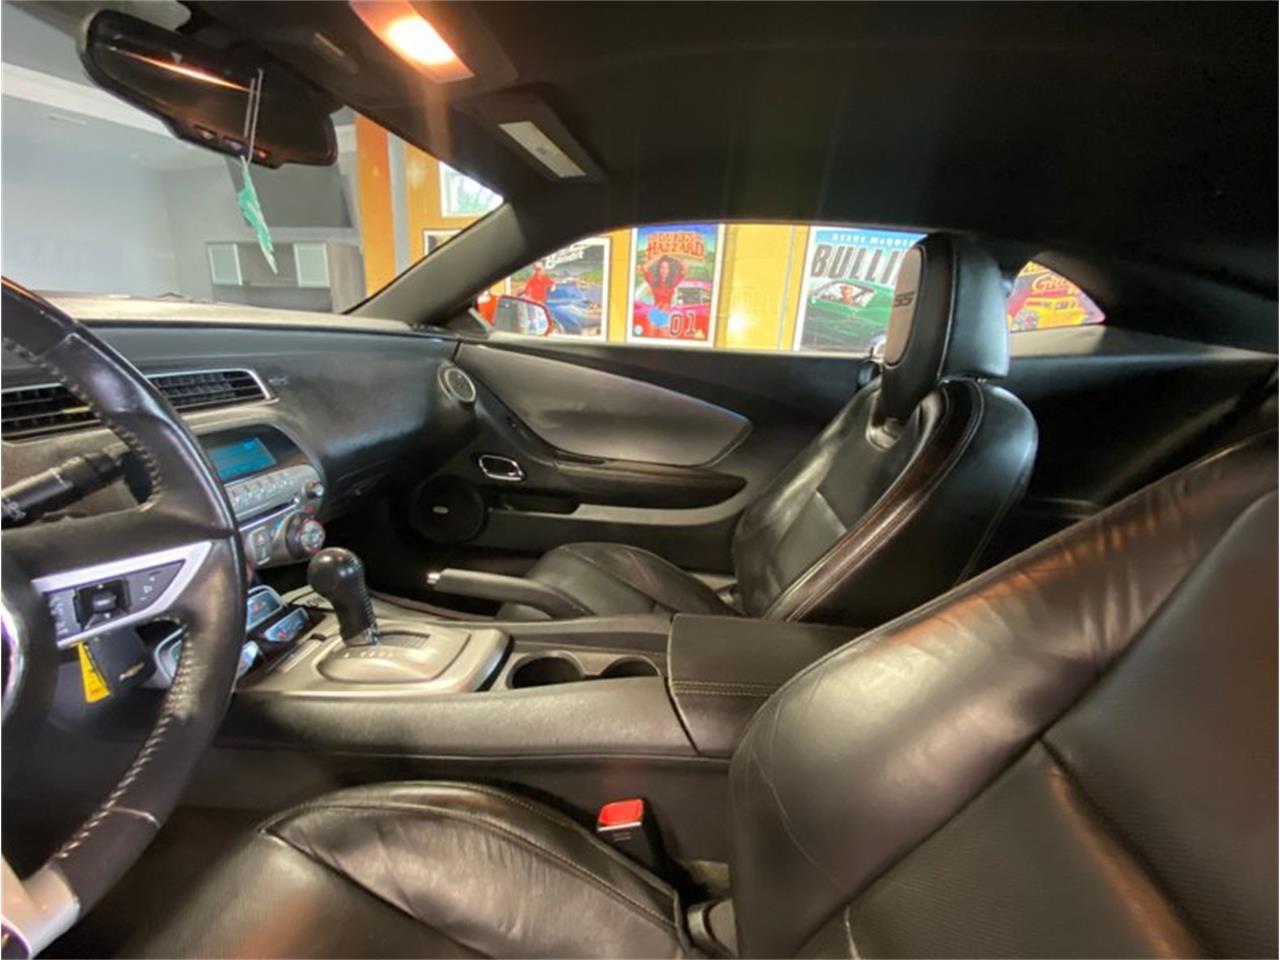 2011 Chevrolet Camaro (CC-1417341) for sale in West Babylon, New York